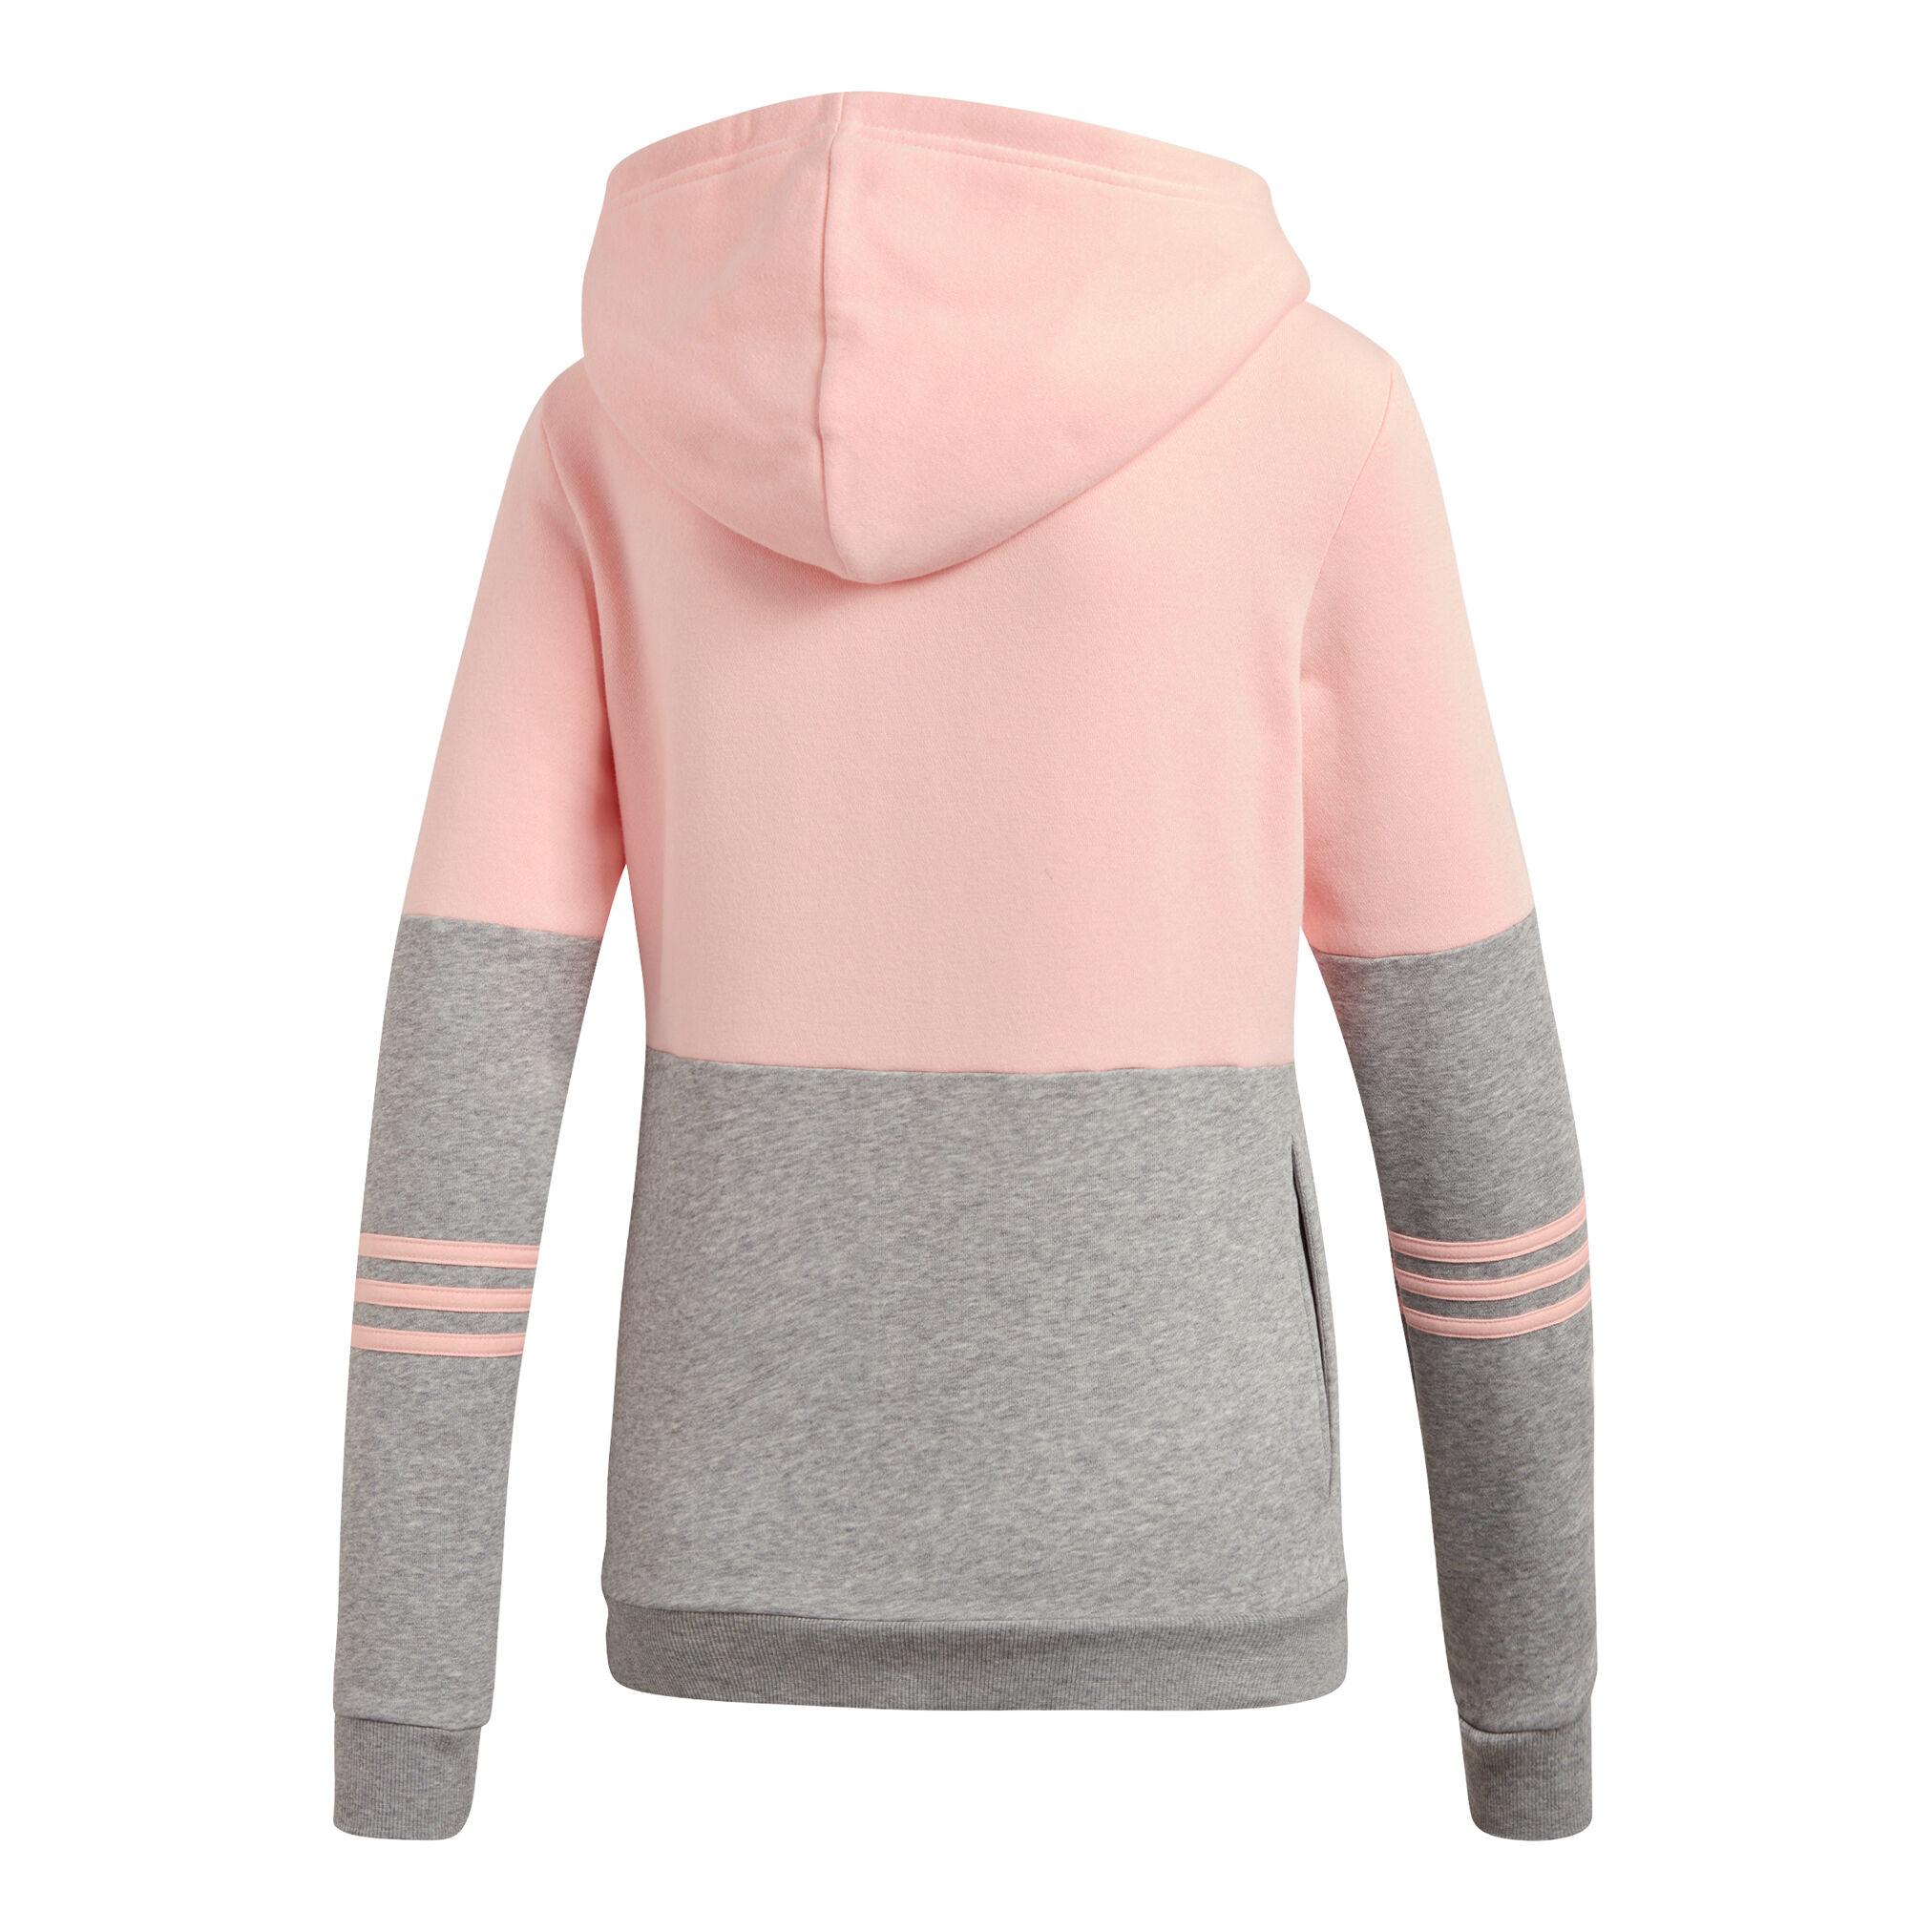 adidas damen trainingsanzug tracksuite polyester cosy